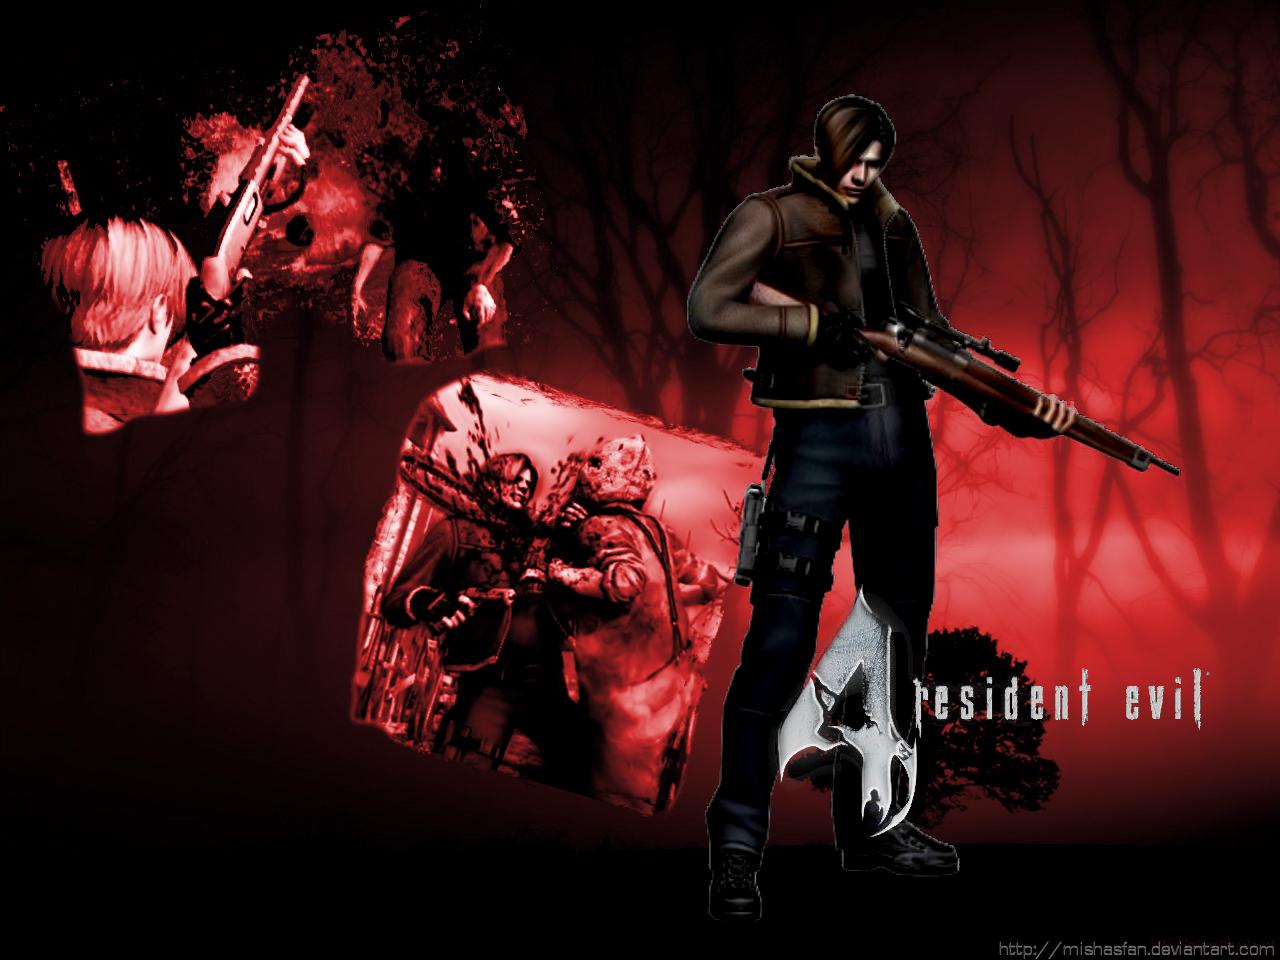 Resident Evil 4 Wallpaper By Manic Misha On Deviantart